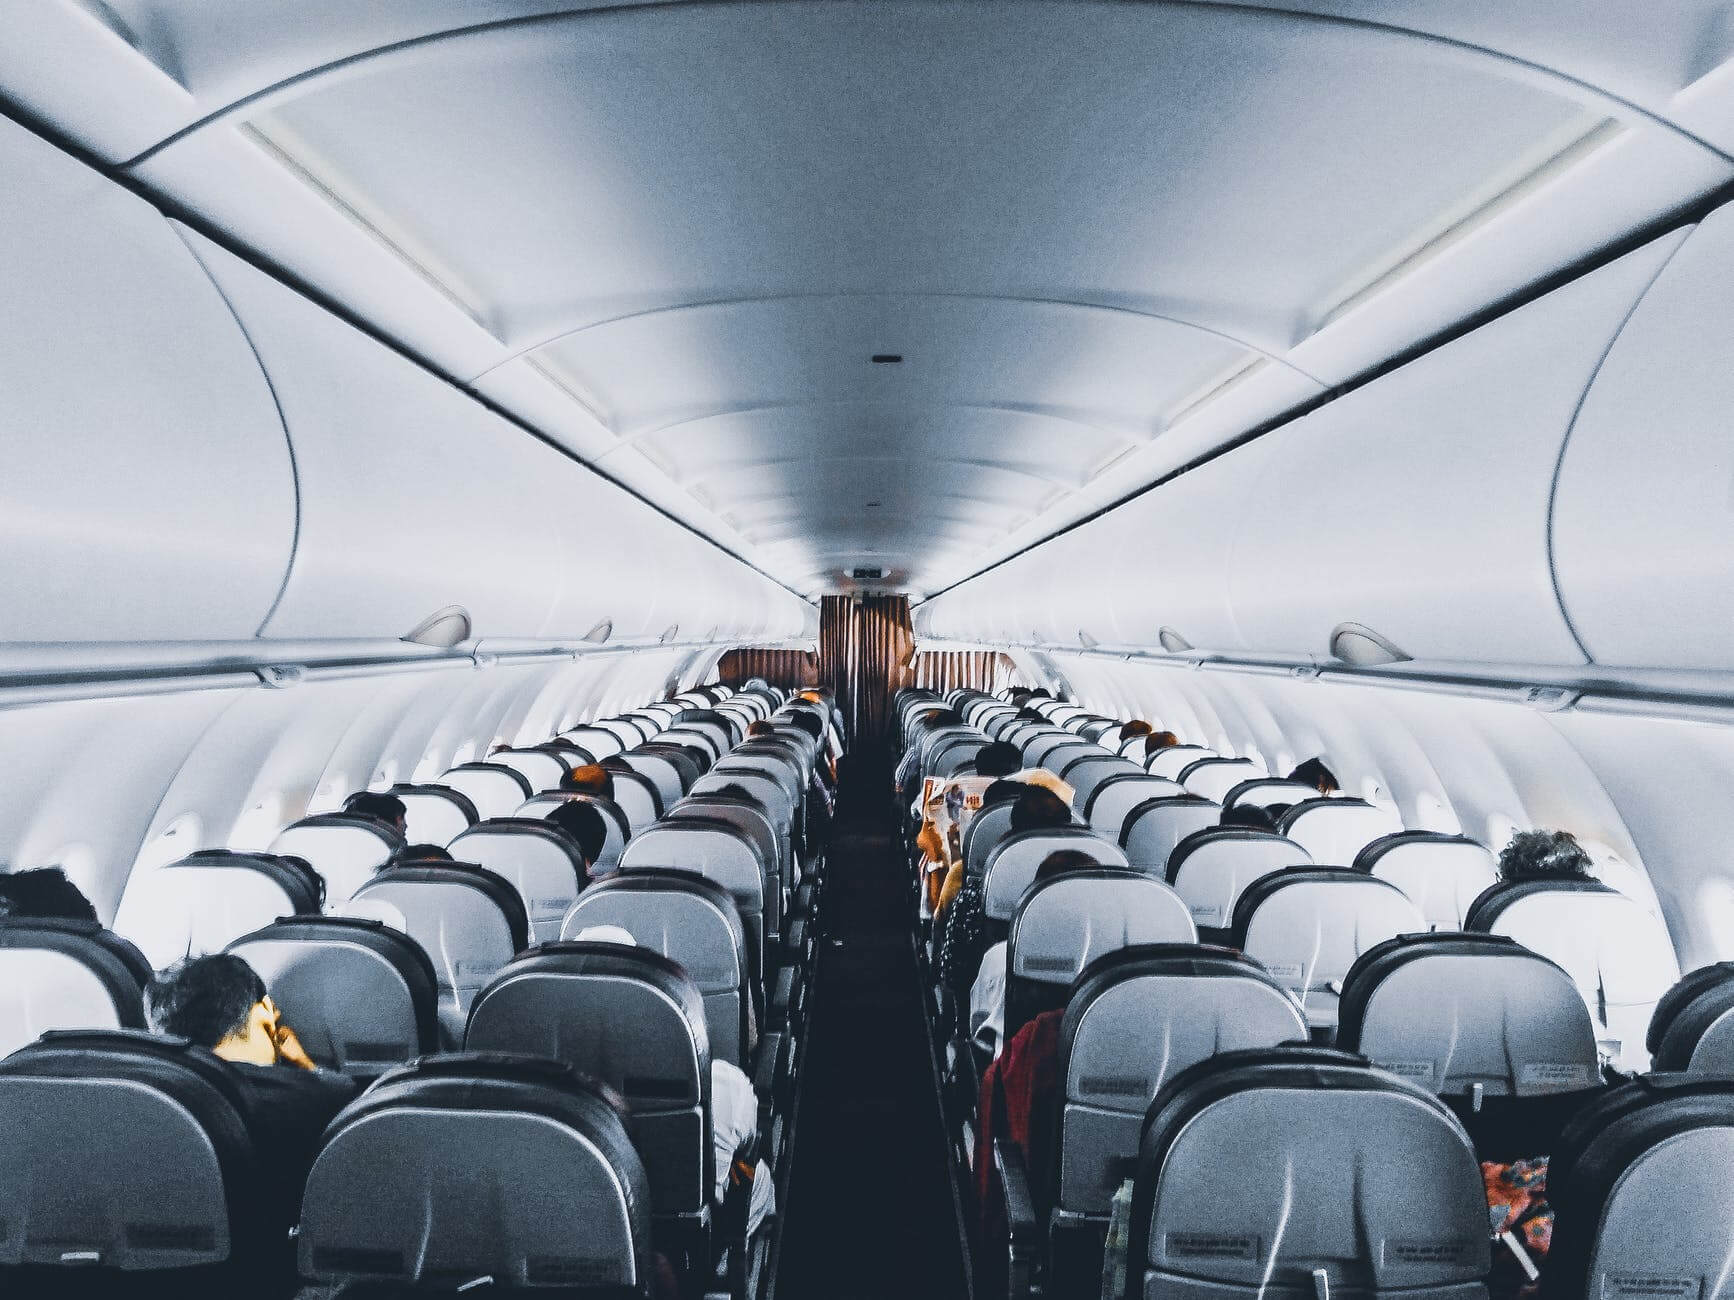 Sleeping On A Plane 101 - Tips & Tricks to sleeping on an airplane